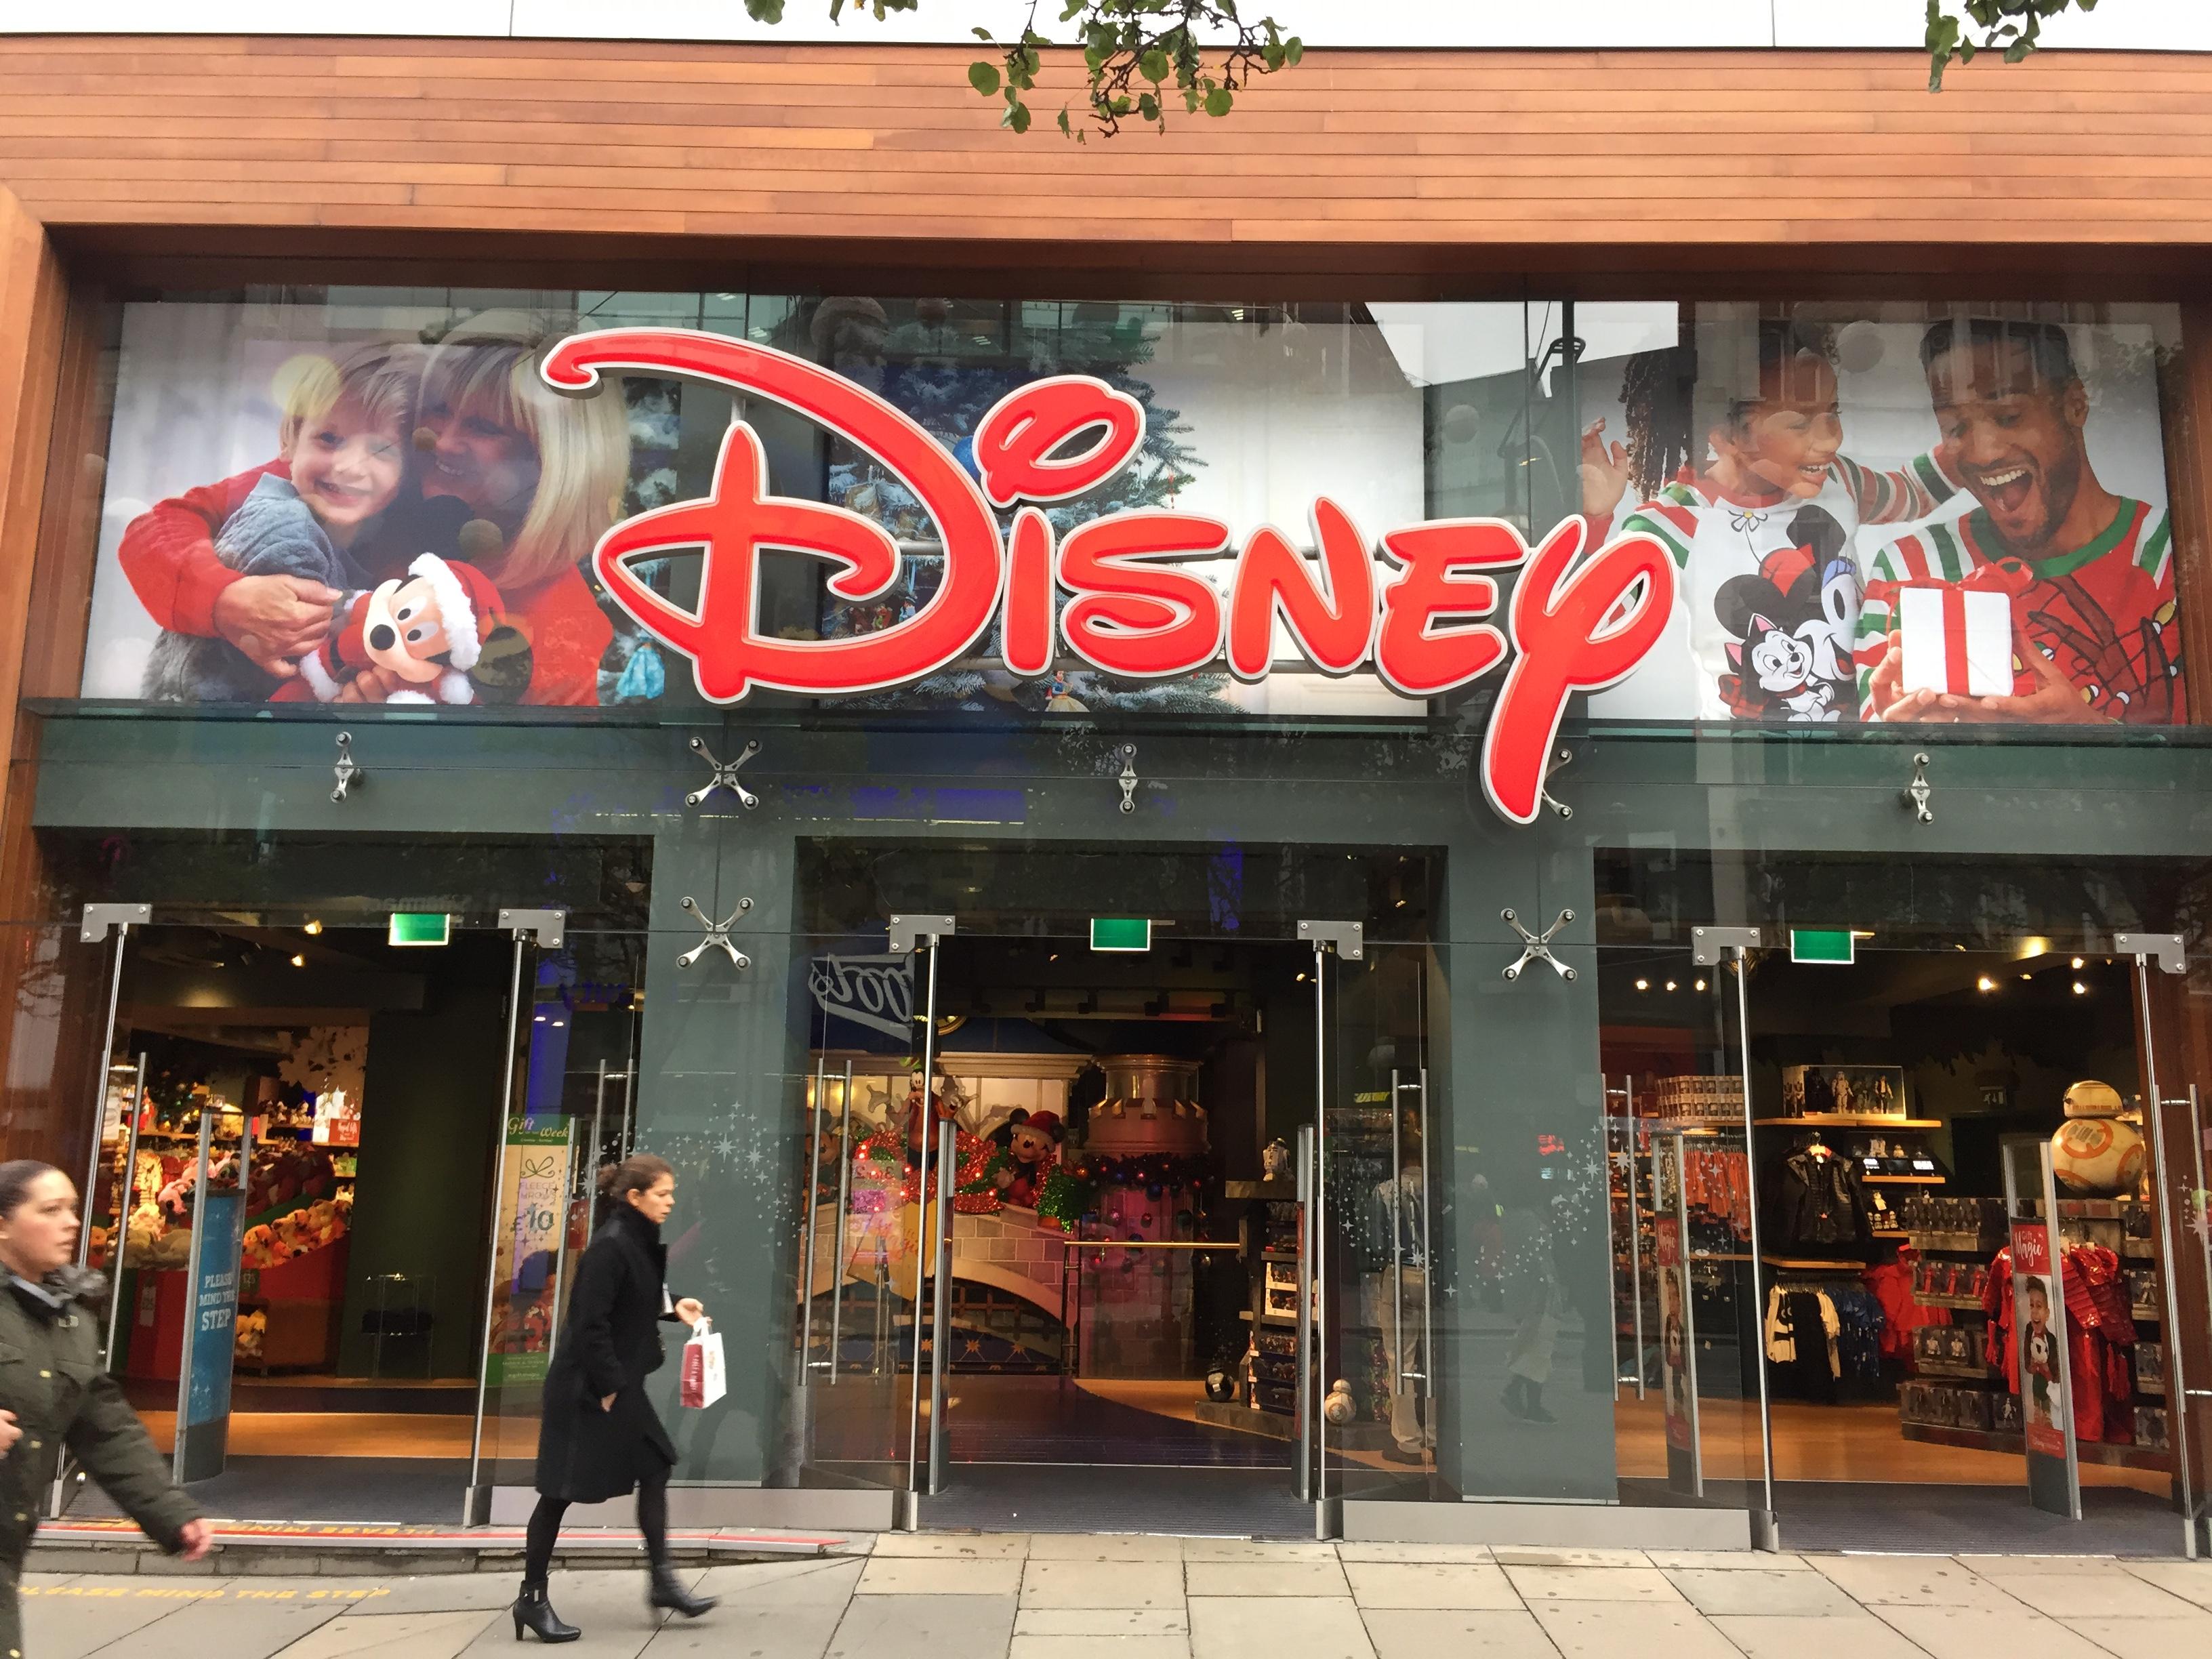 Disney Store now affiliates of BLC